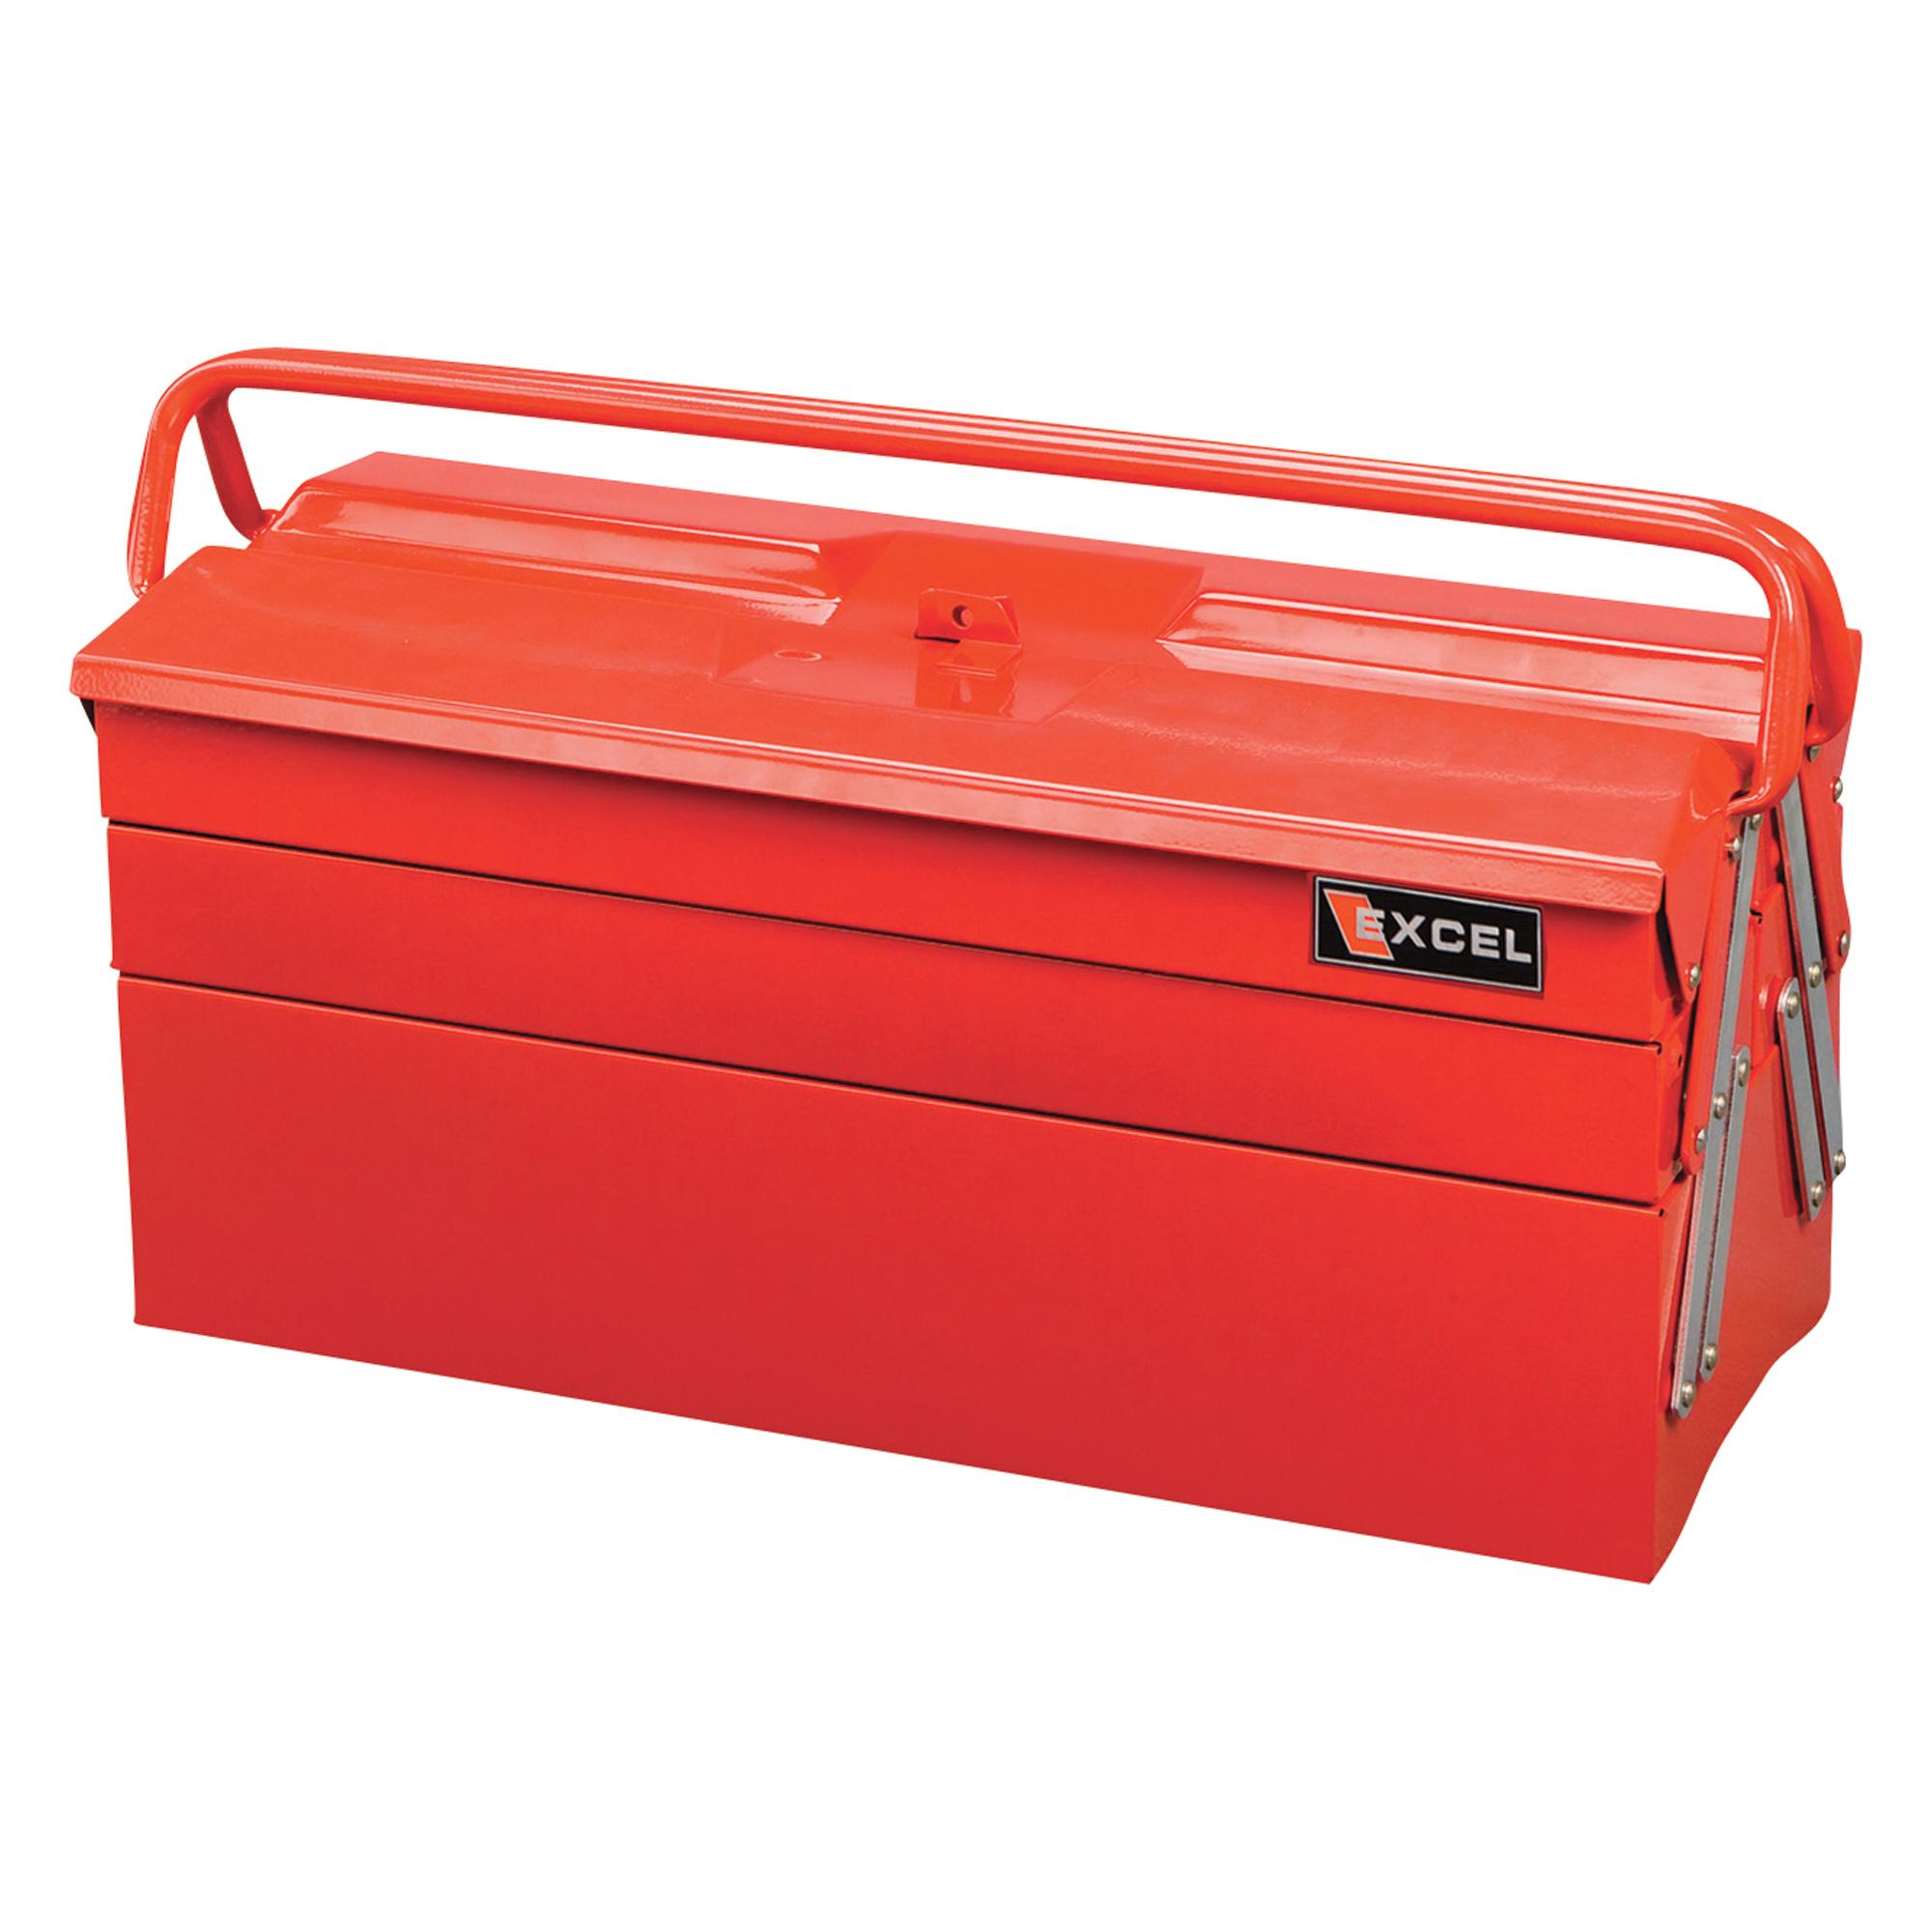 toolbox clipart - photo #39